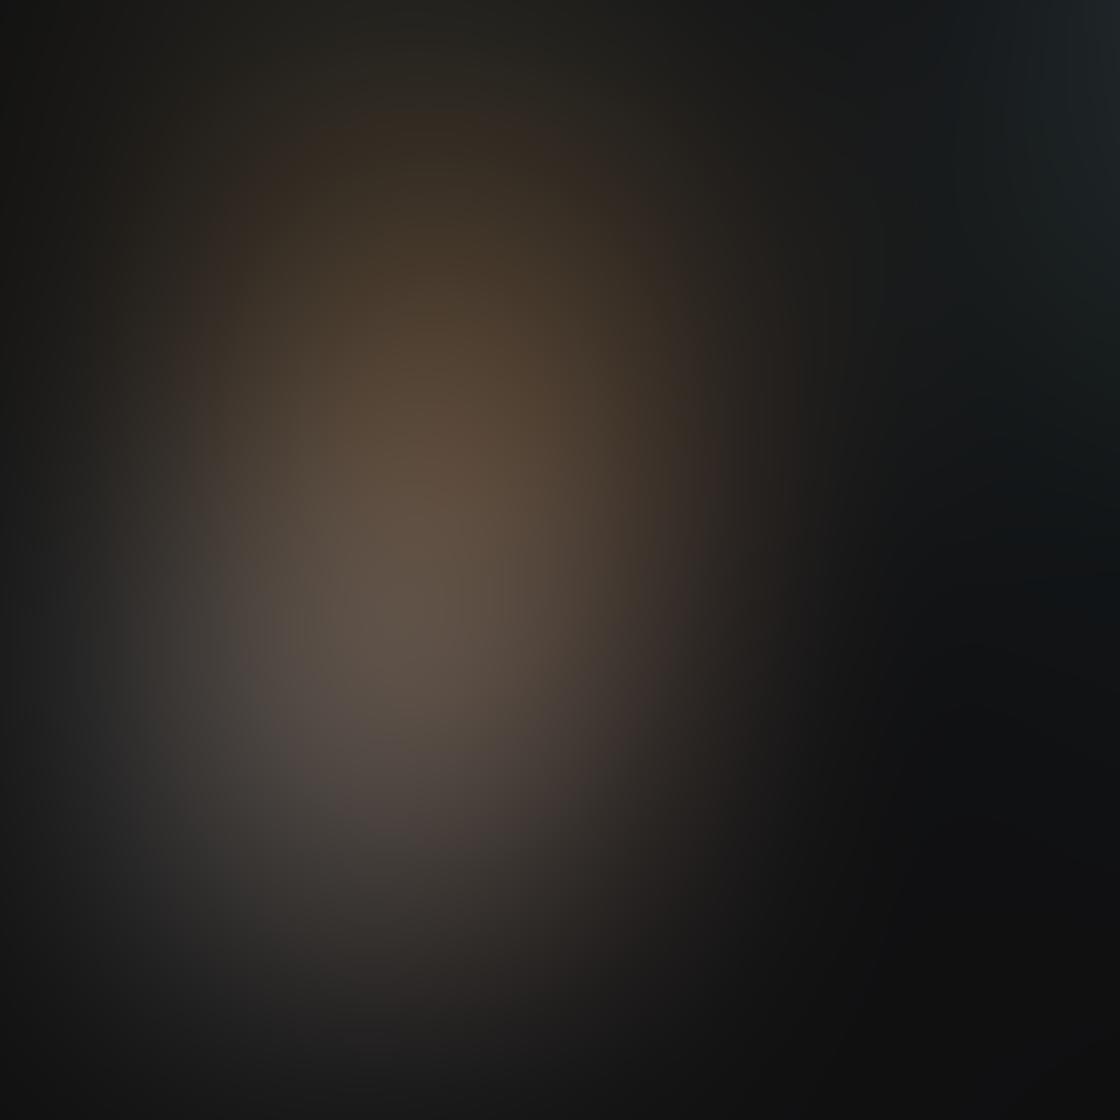 Silhouette iPhone Photos 102